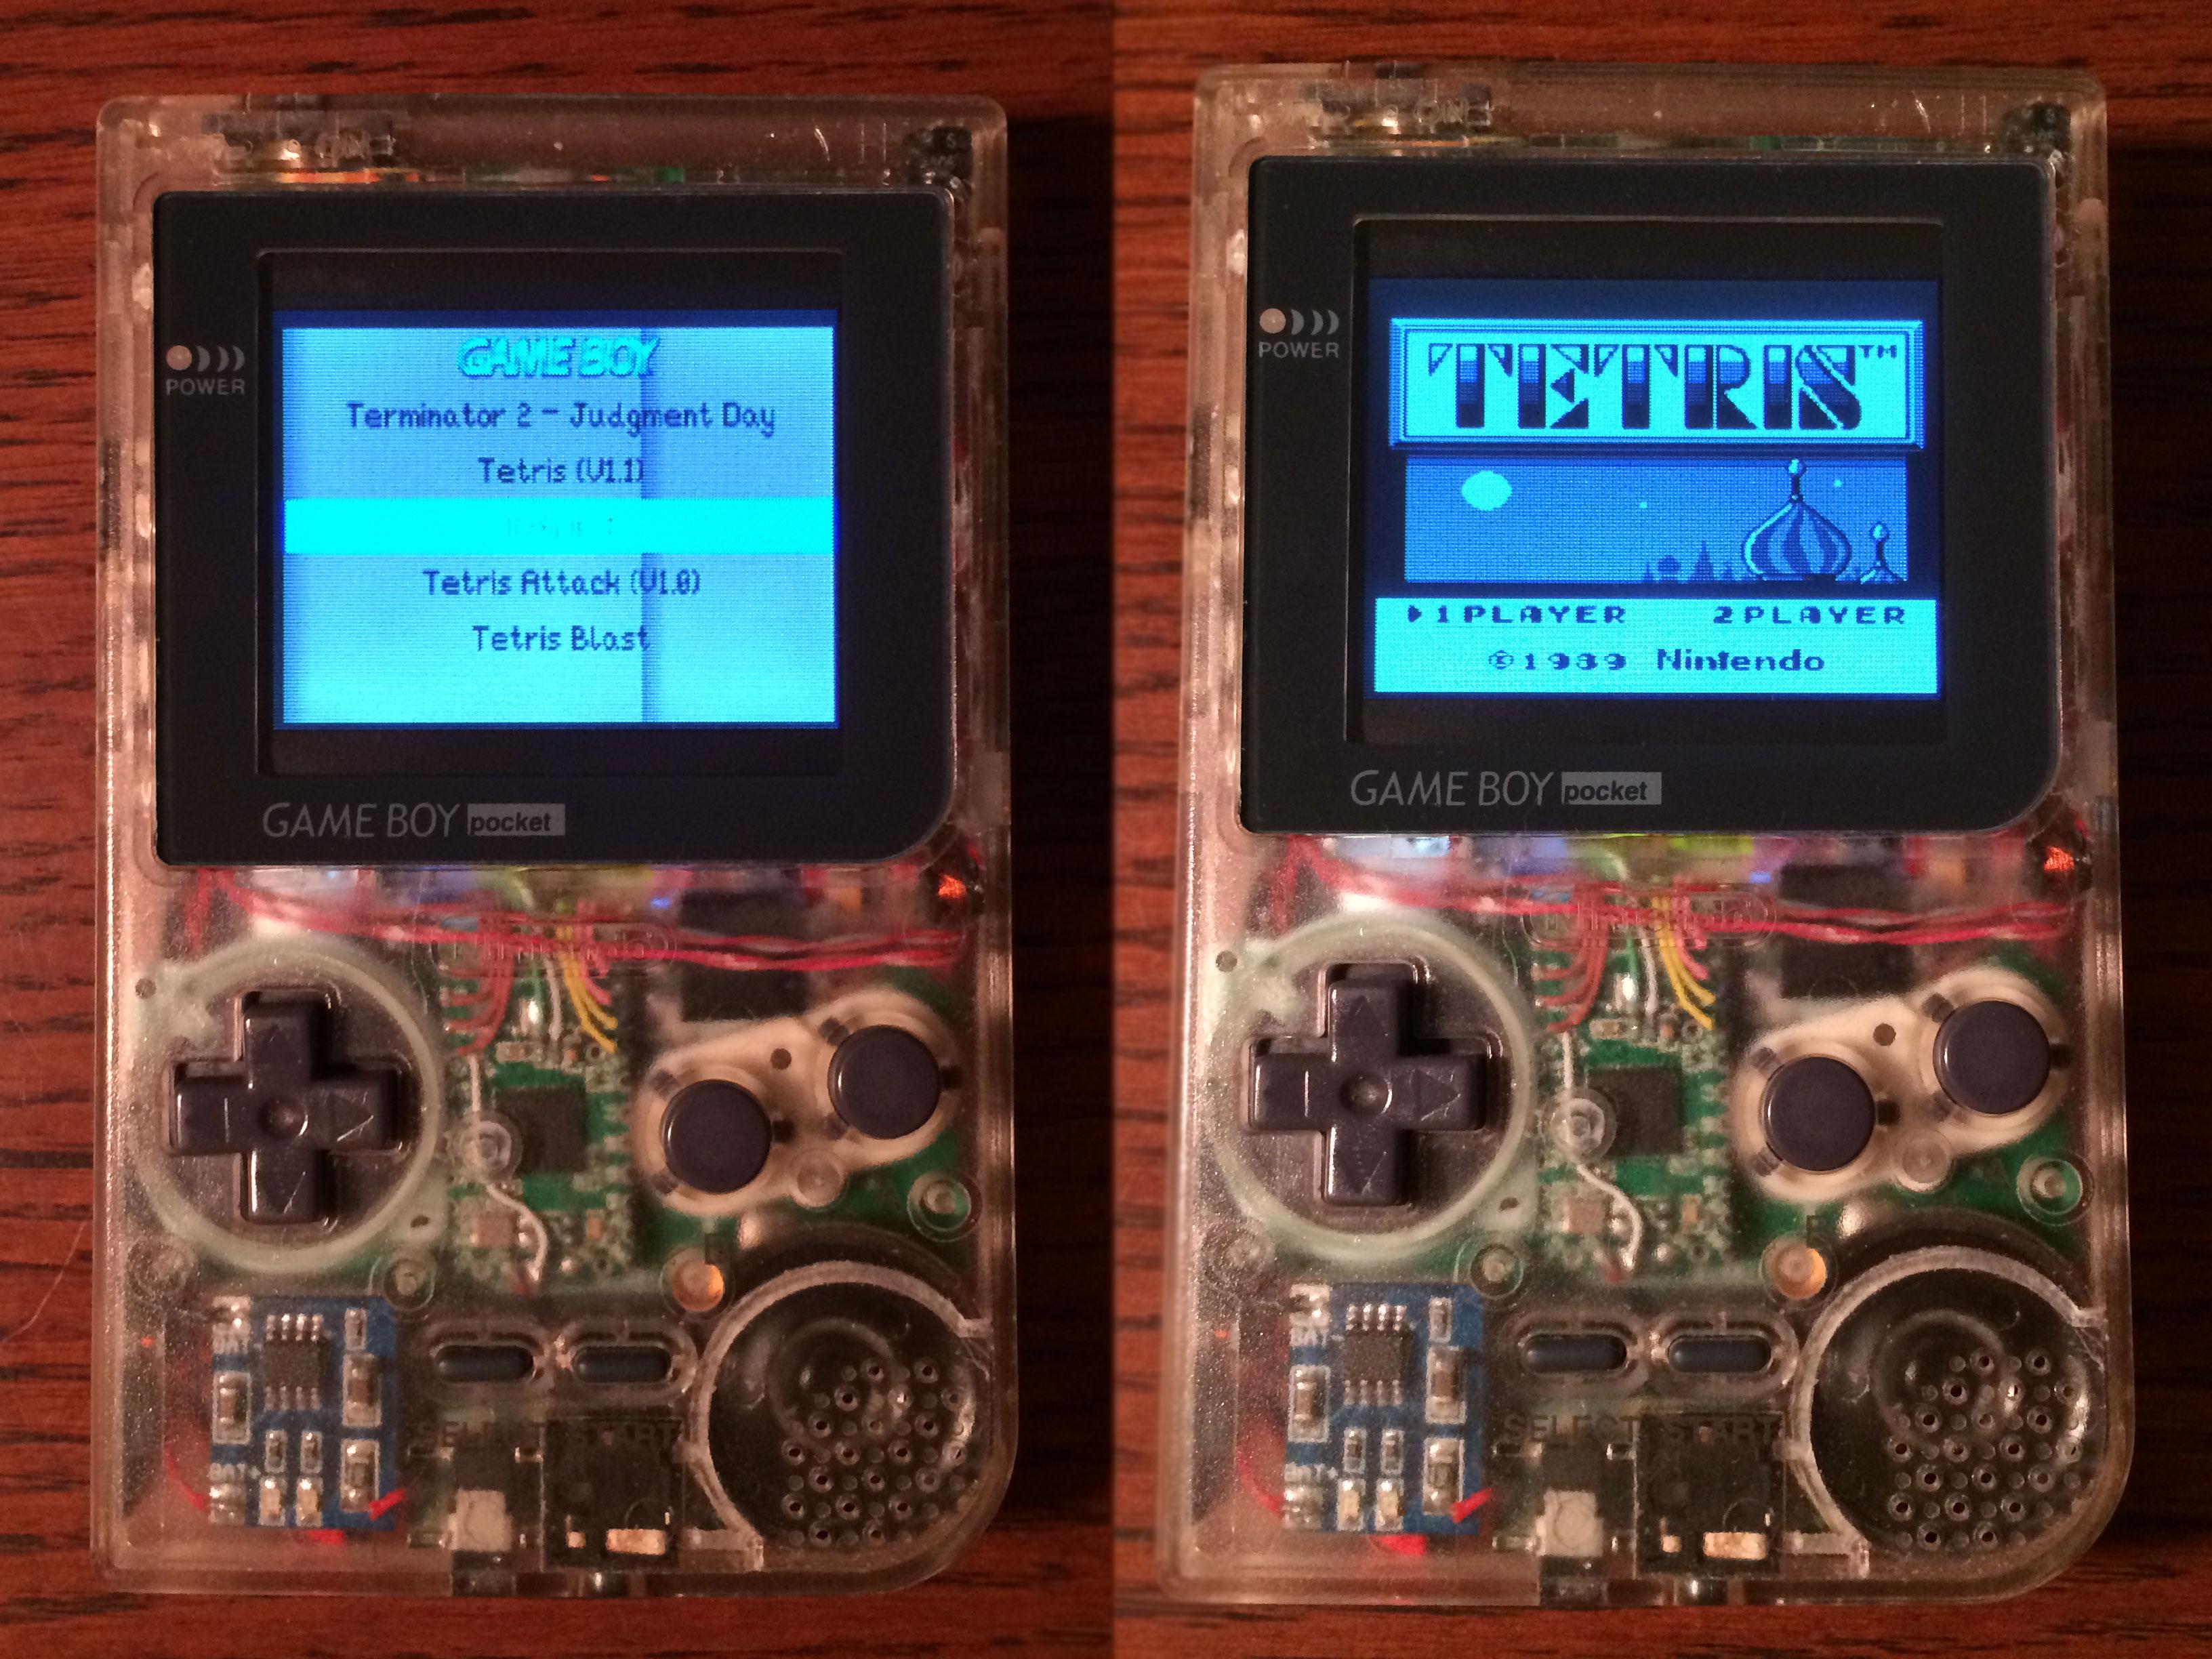 DIY Game Boy Pocket Using the Raspberry Pi